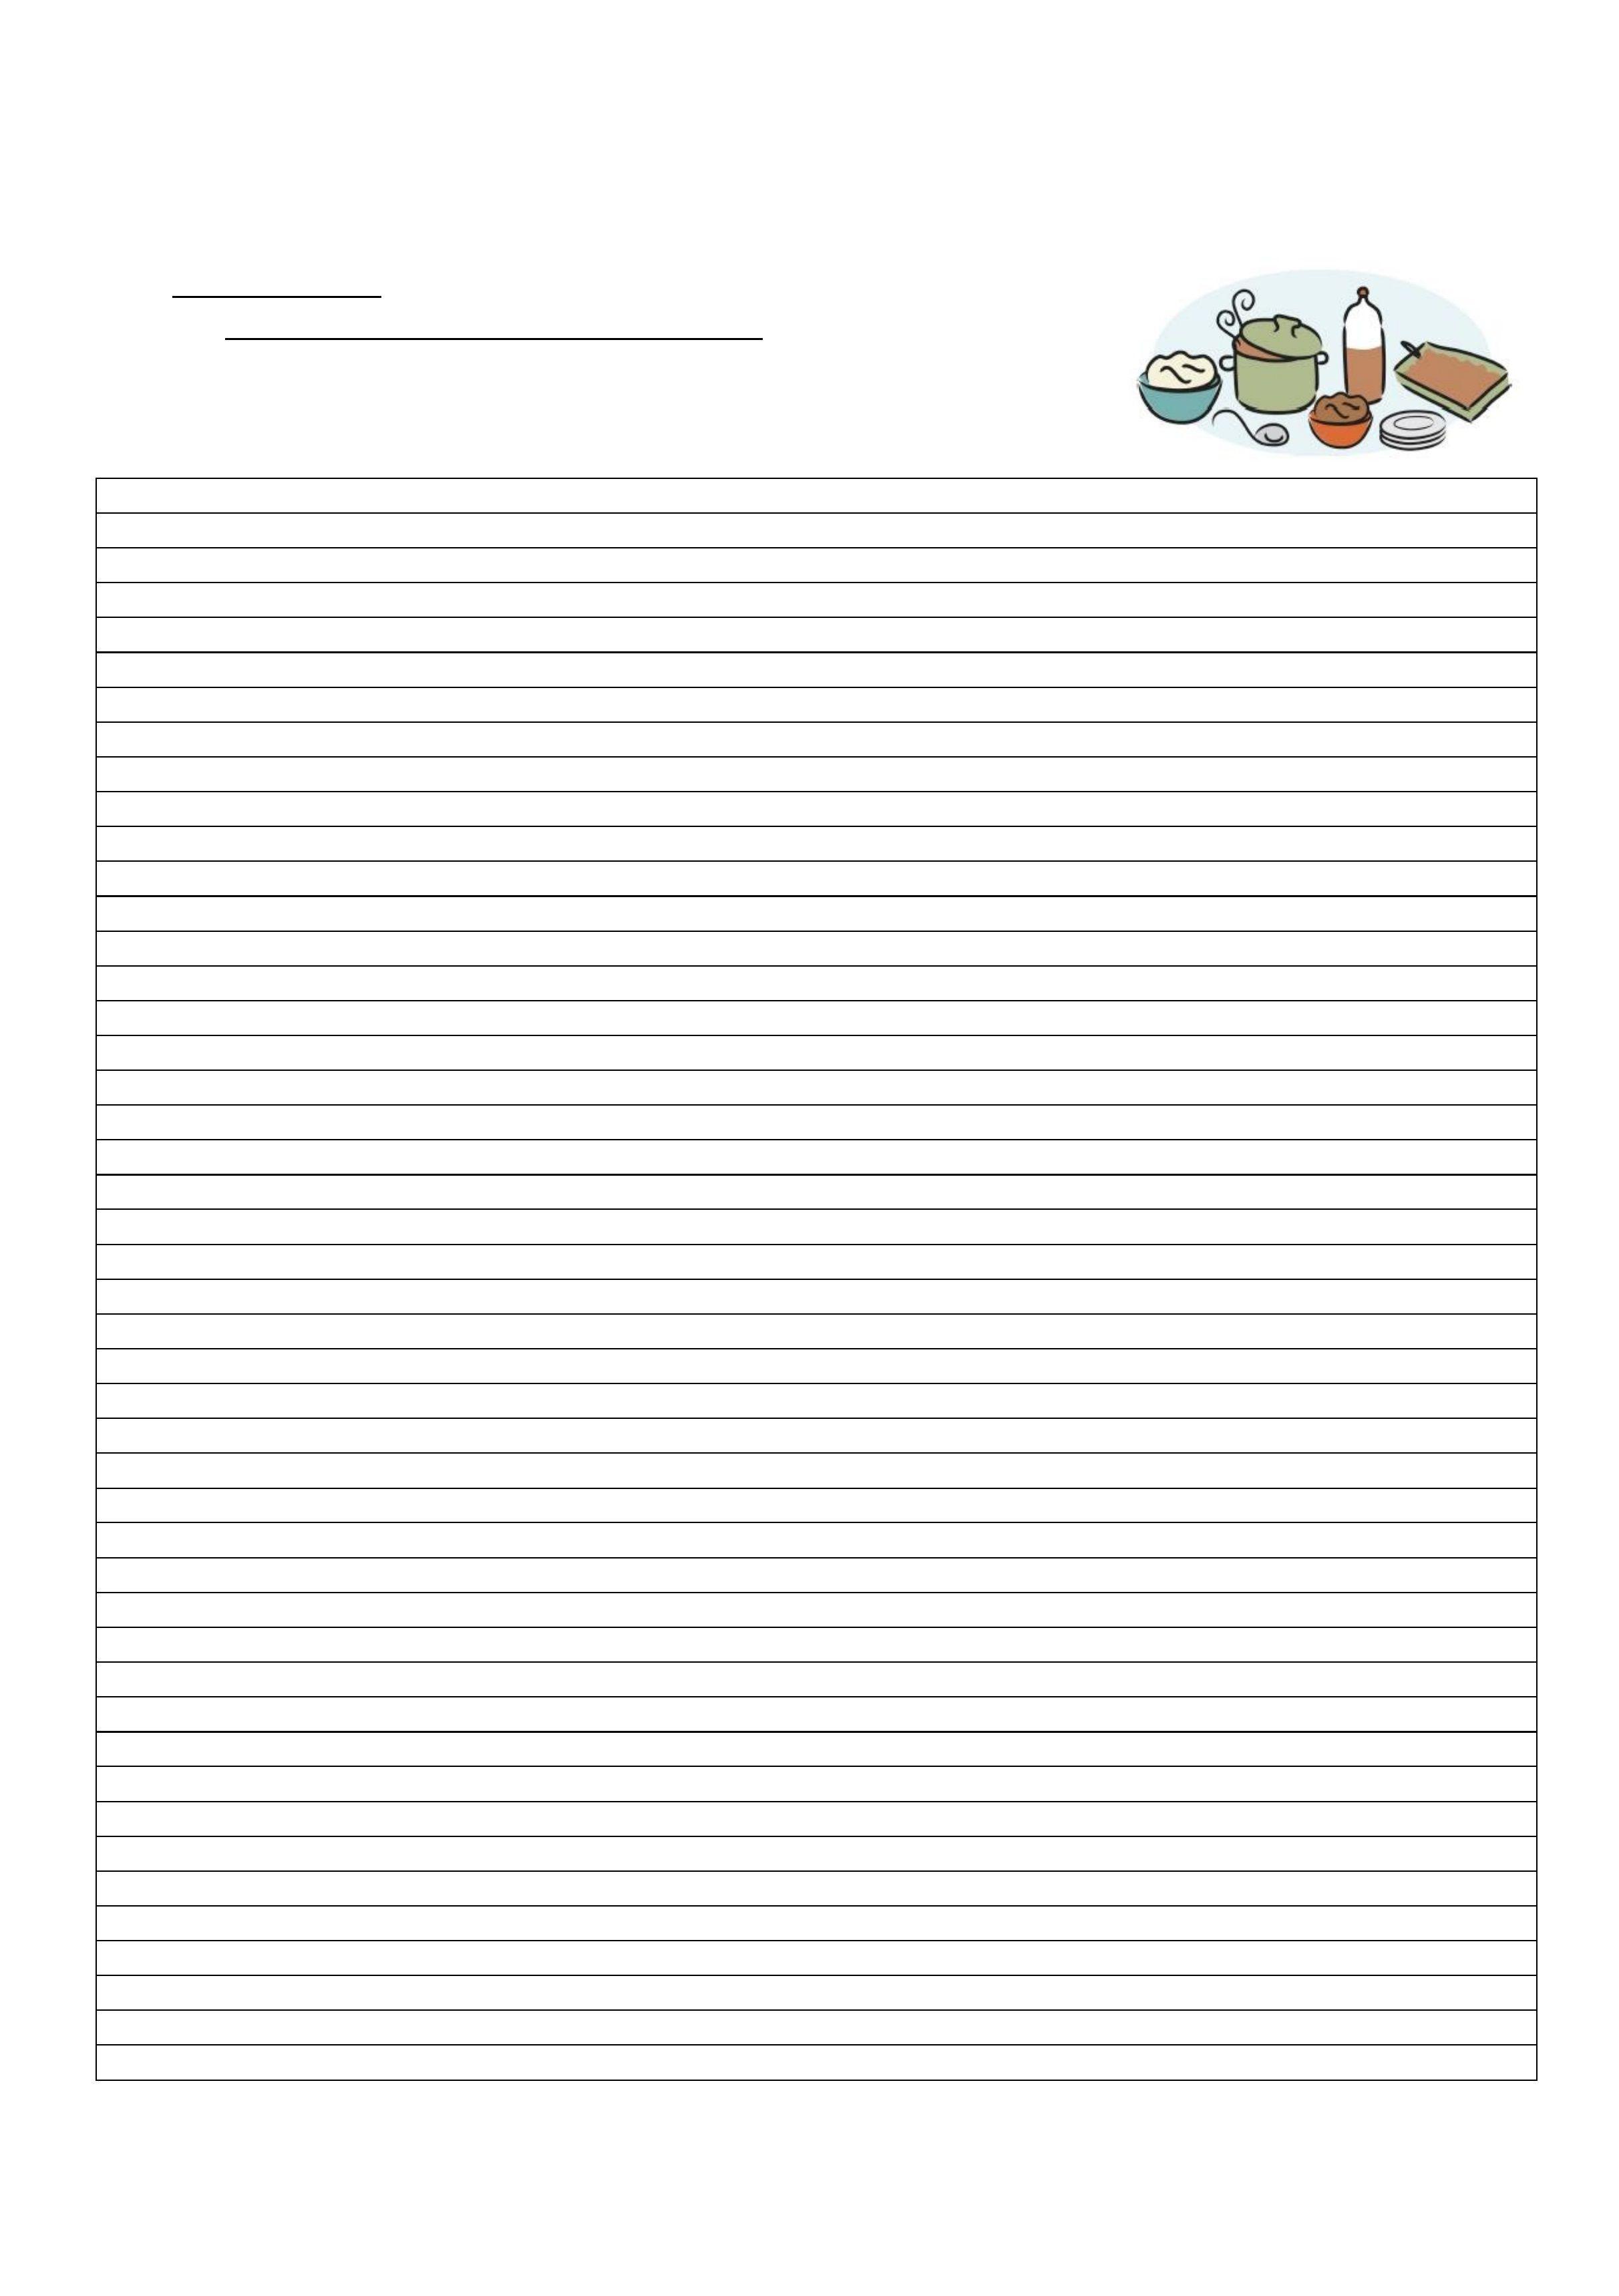 003 Breathtaking Potluck Sign Up Sheet Template Example  Pdf Google Doc Free PrintableFull